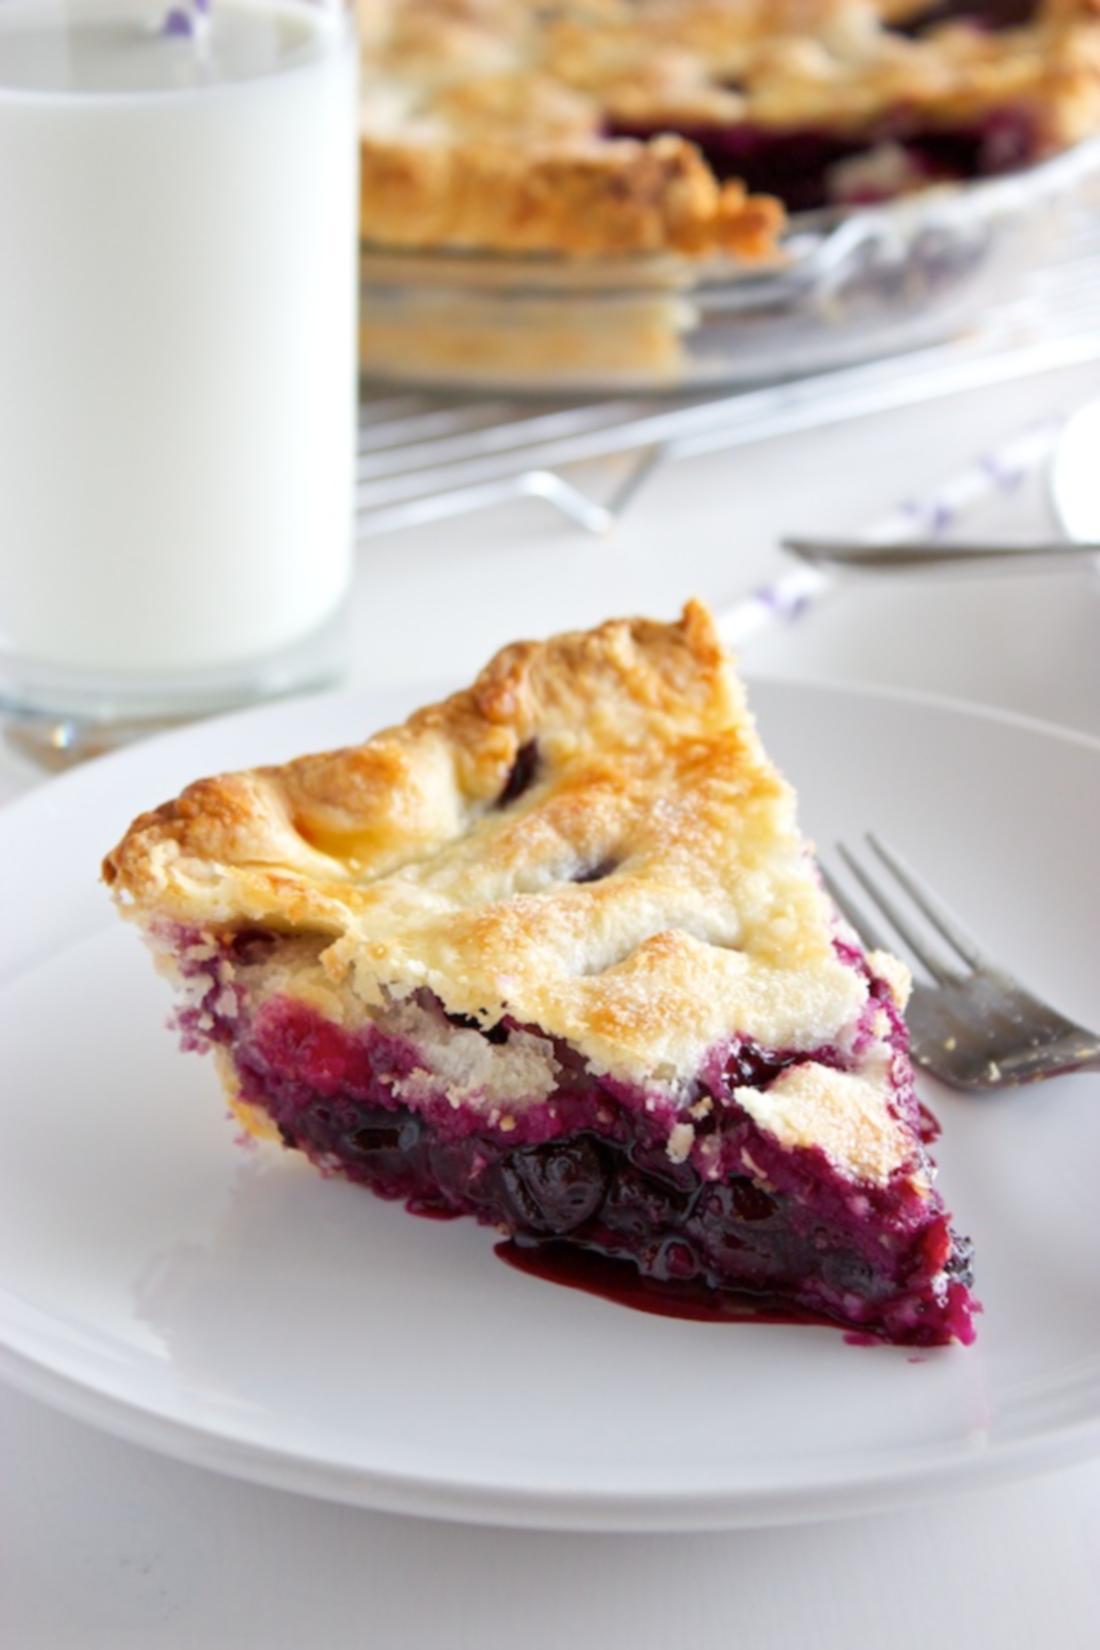 Blueberry Pie Recipe | Online Food Blogger